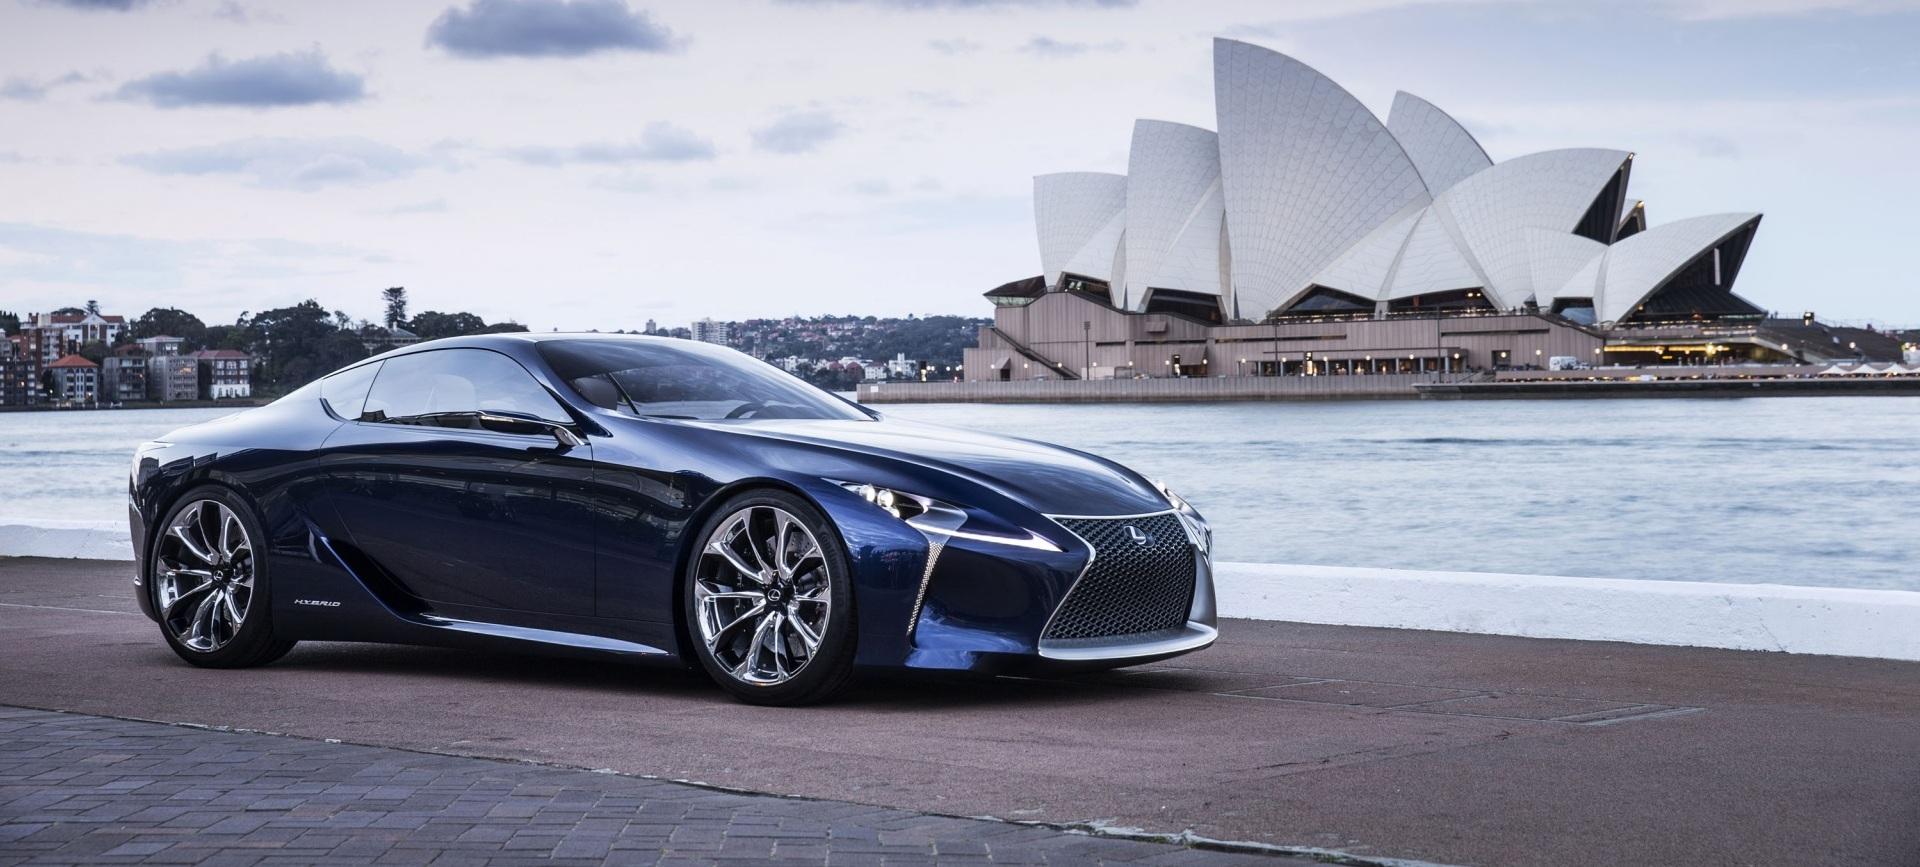 Download Wallpaper Car Blue Pictures